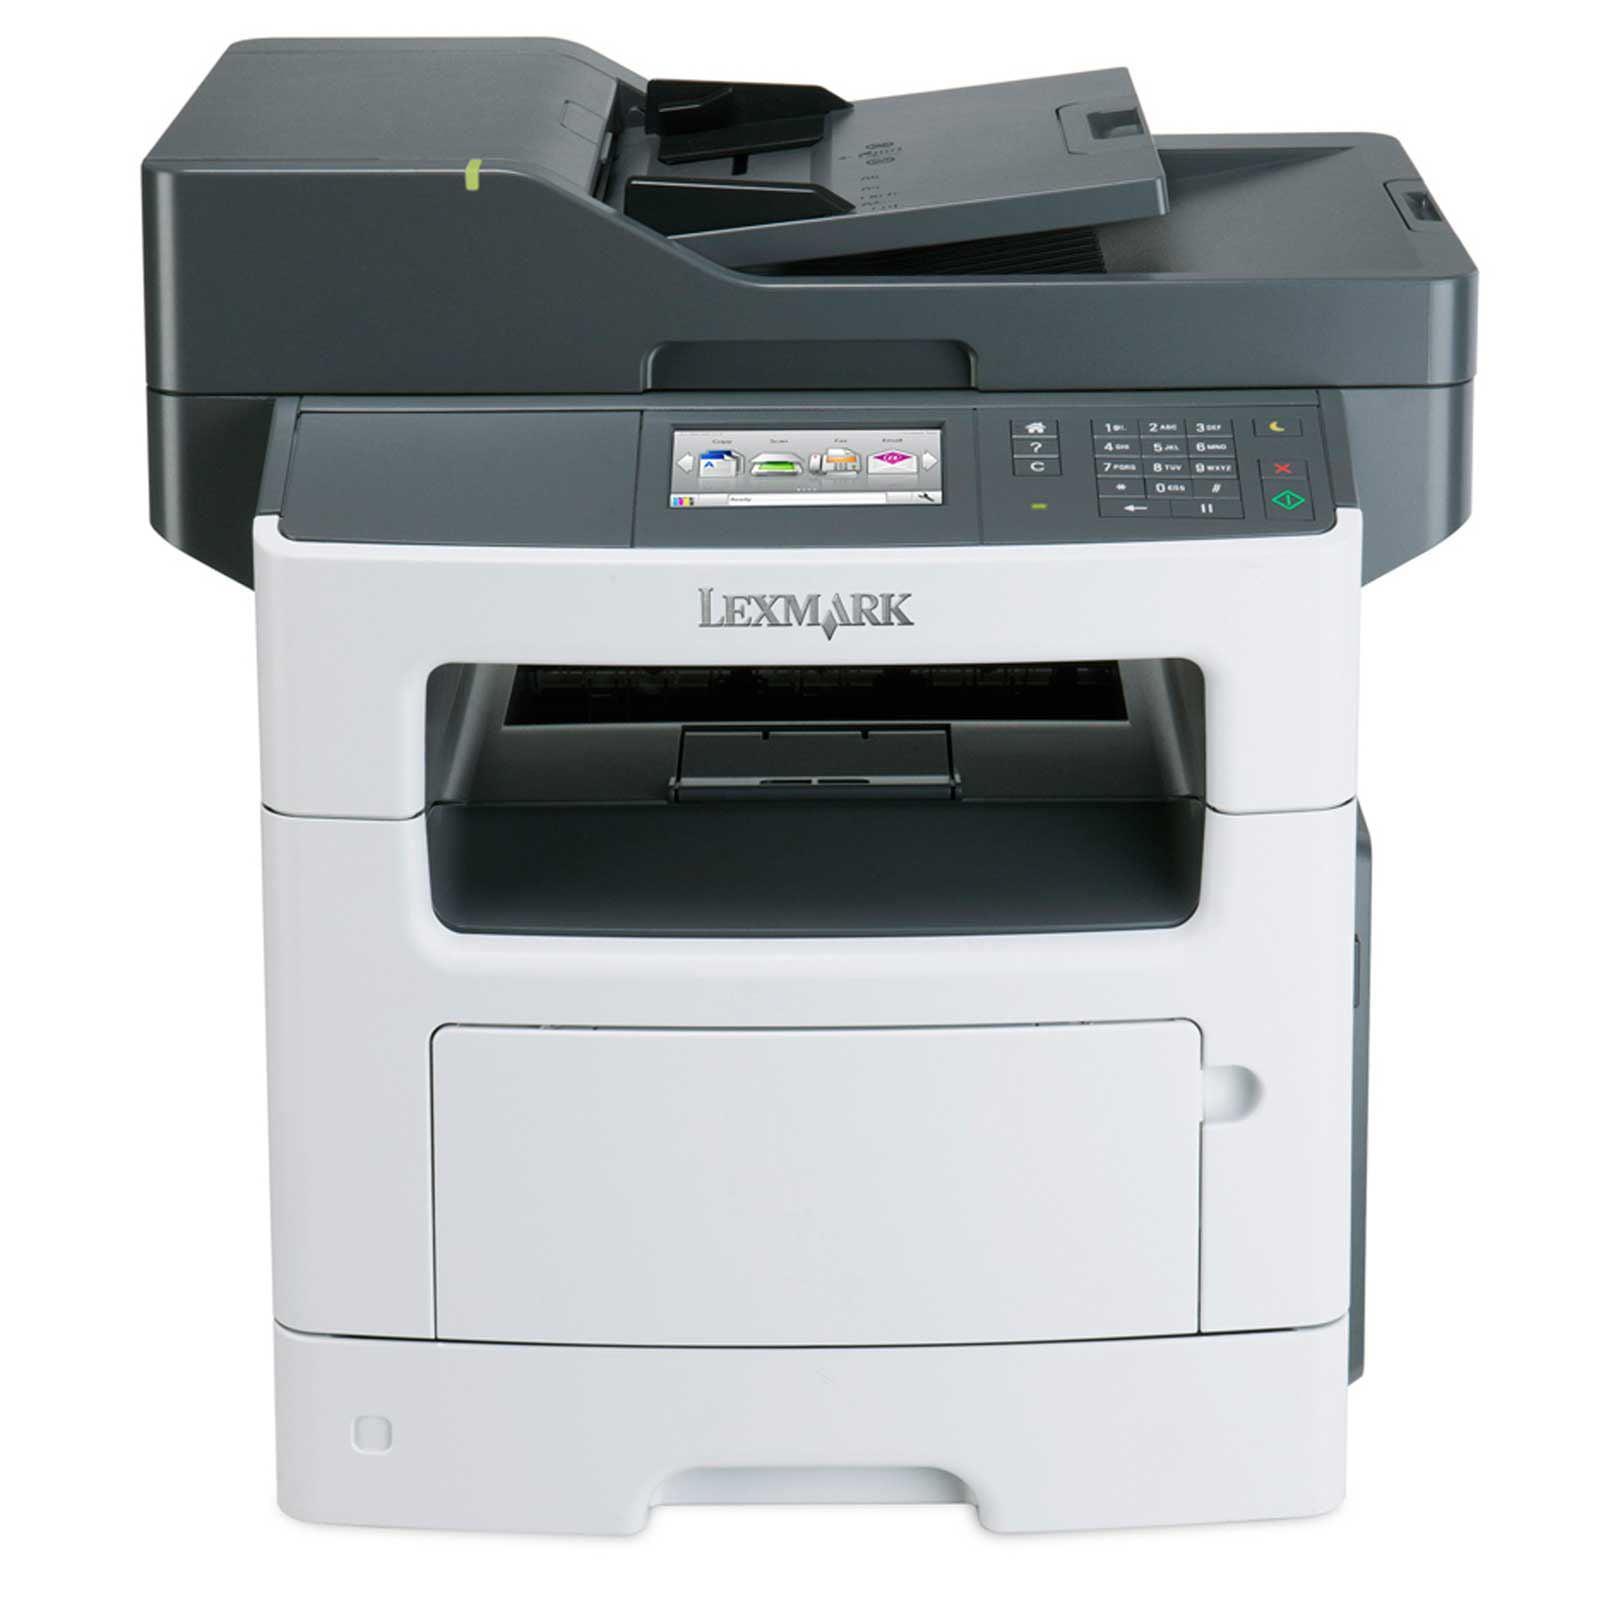 Lexmark MX511DHE All-In-One Fax, Copier, Scanner Black & White Laser Printer (Factory